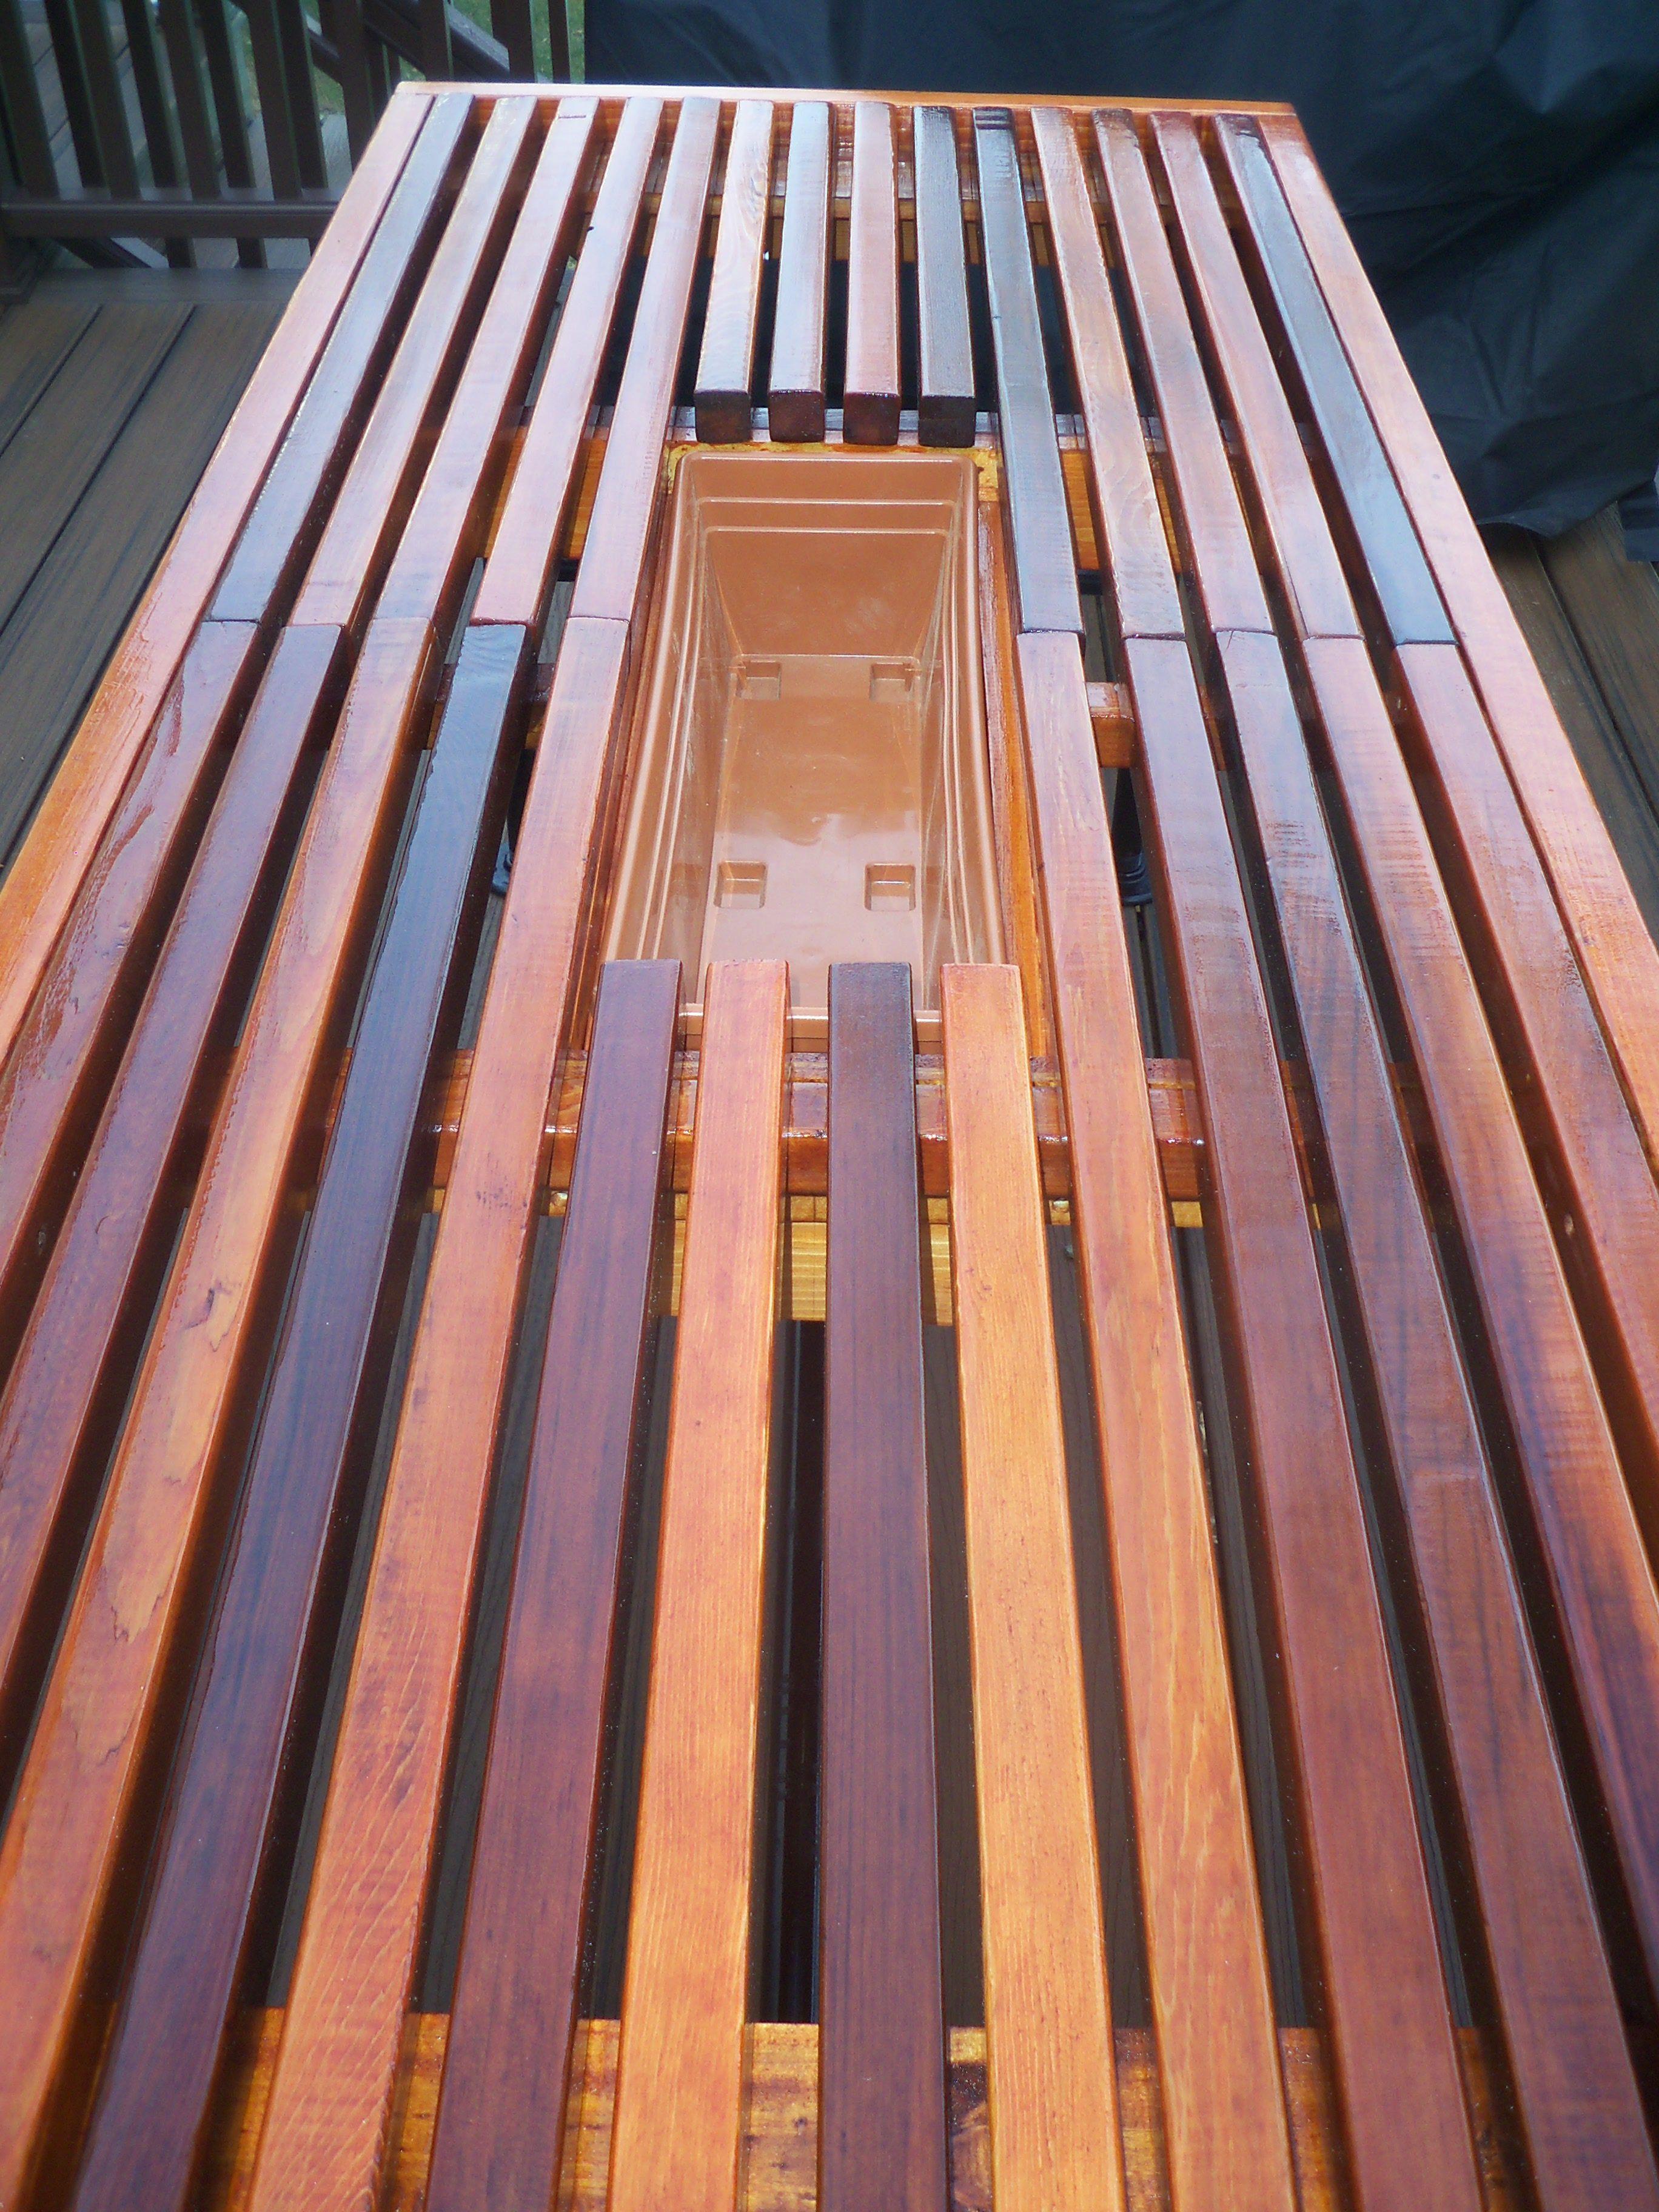 Cedar Outdoor Table With Built In Wine U0026 Beer Cooler With Metal Pipe Legs.